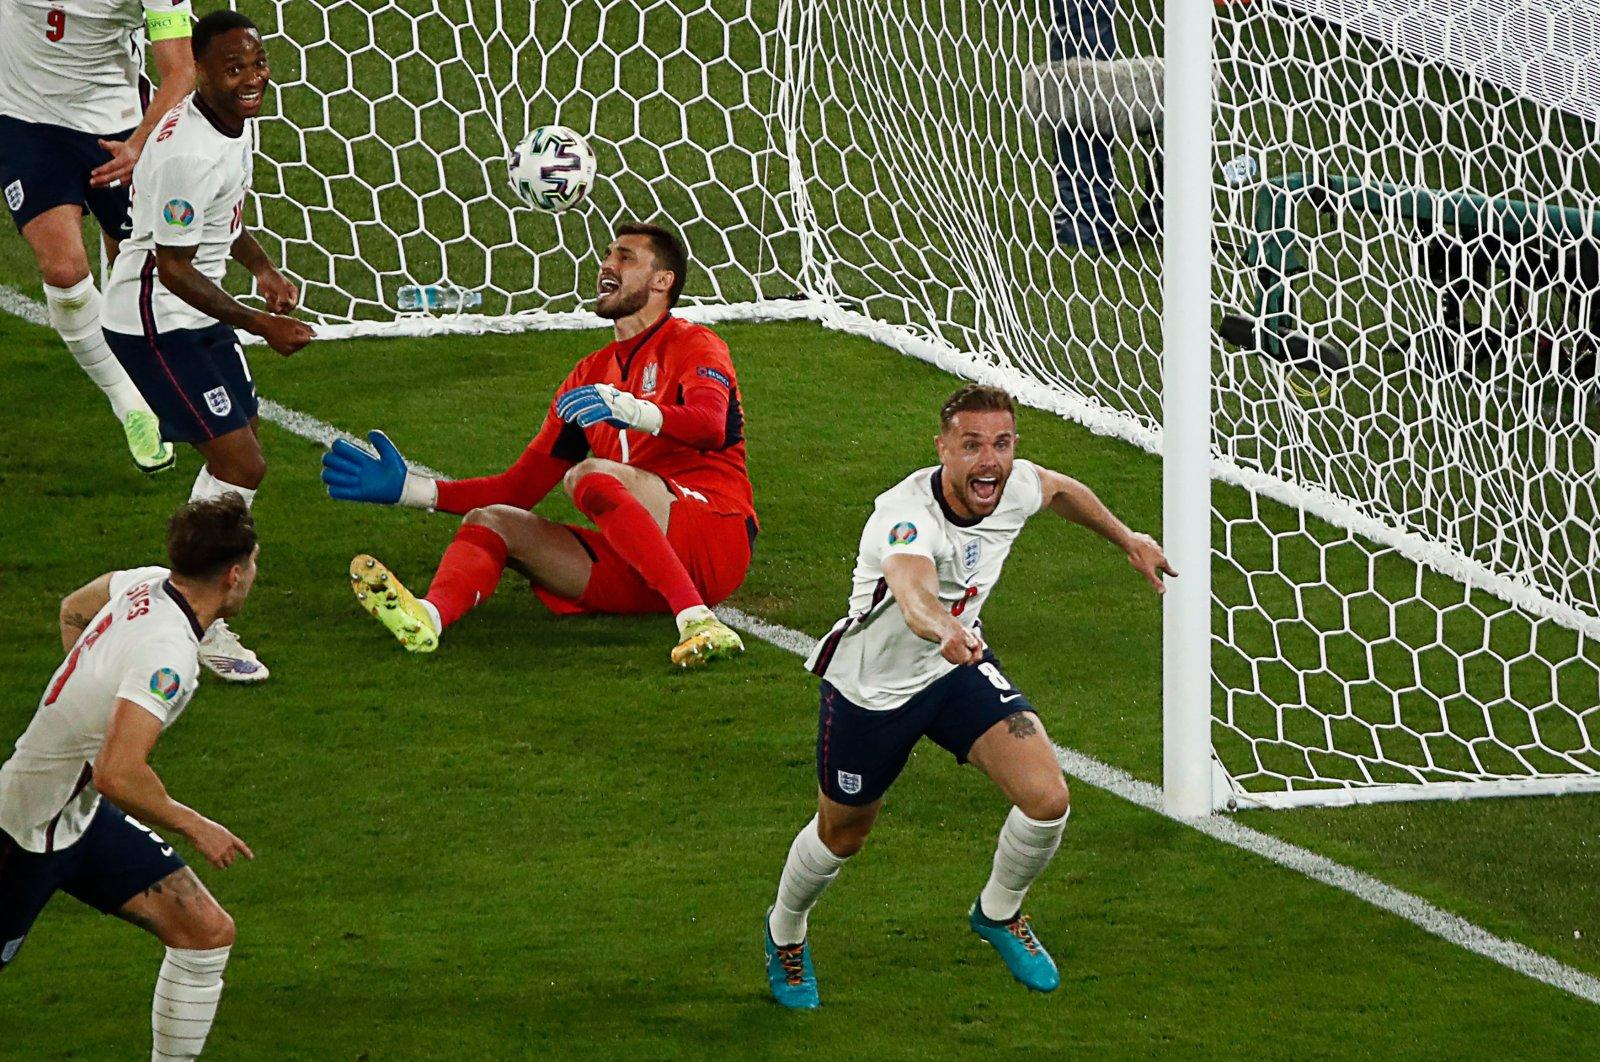 England midfielder Jordan Henderson (R) celebrates scoring the team's fourth goal during the UEFA Euro 2020 quarterfinal match against Ukraine at the Olympic Stadium, Rome, July 3, 2021. (AFP Photo)